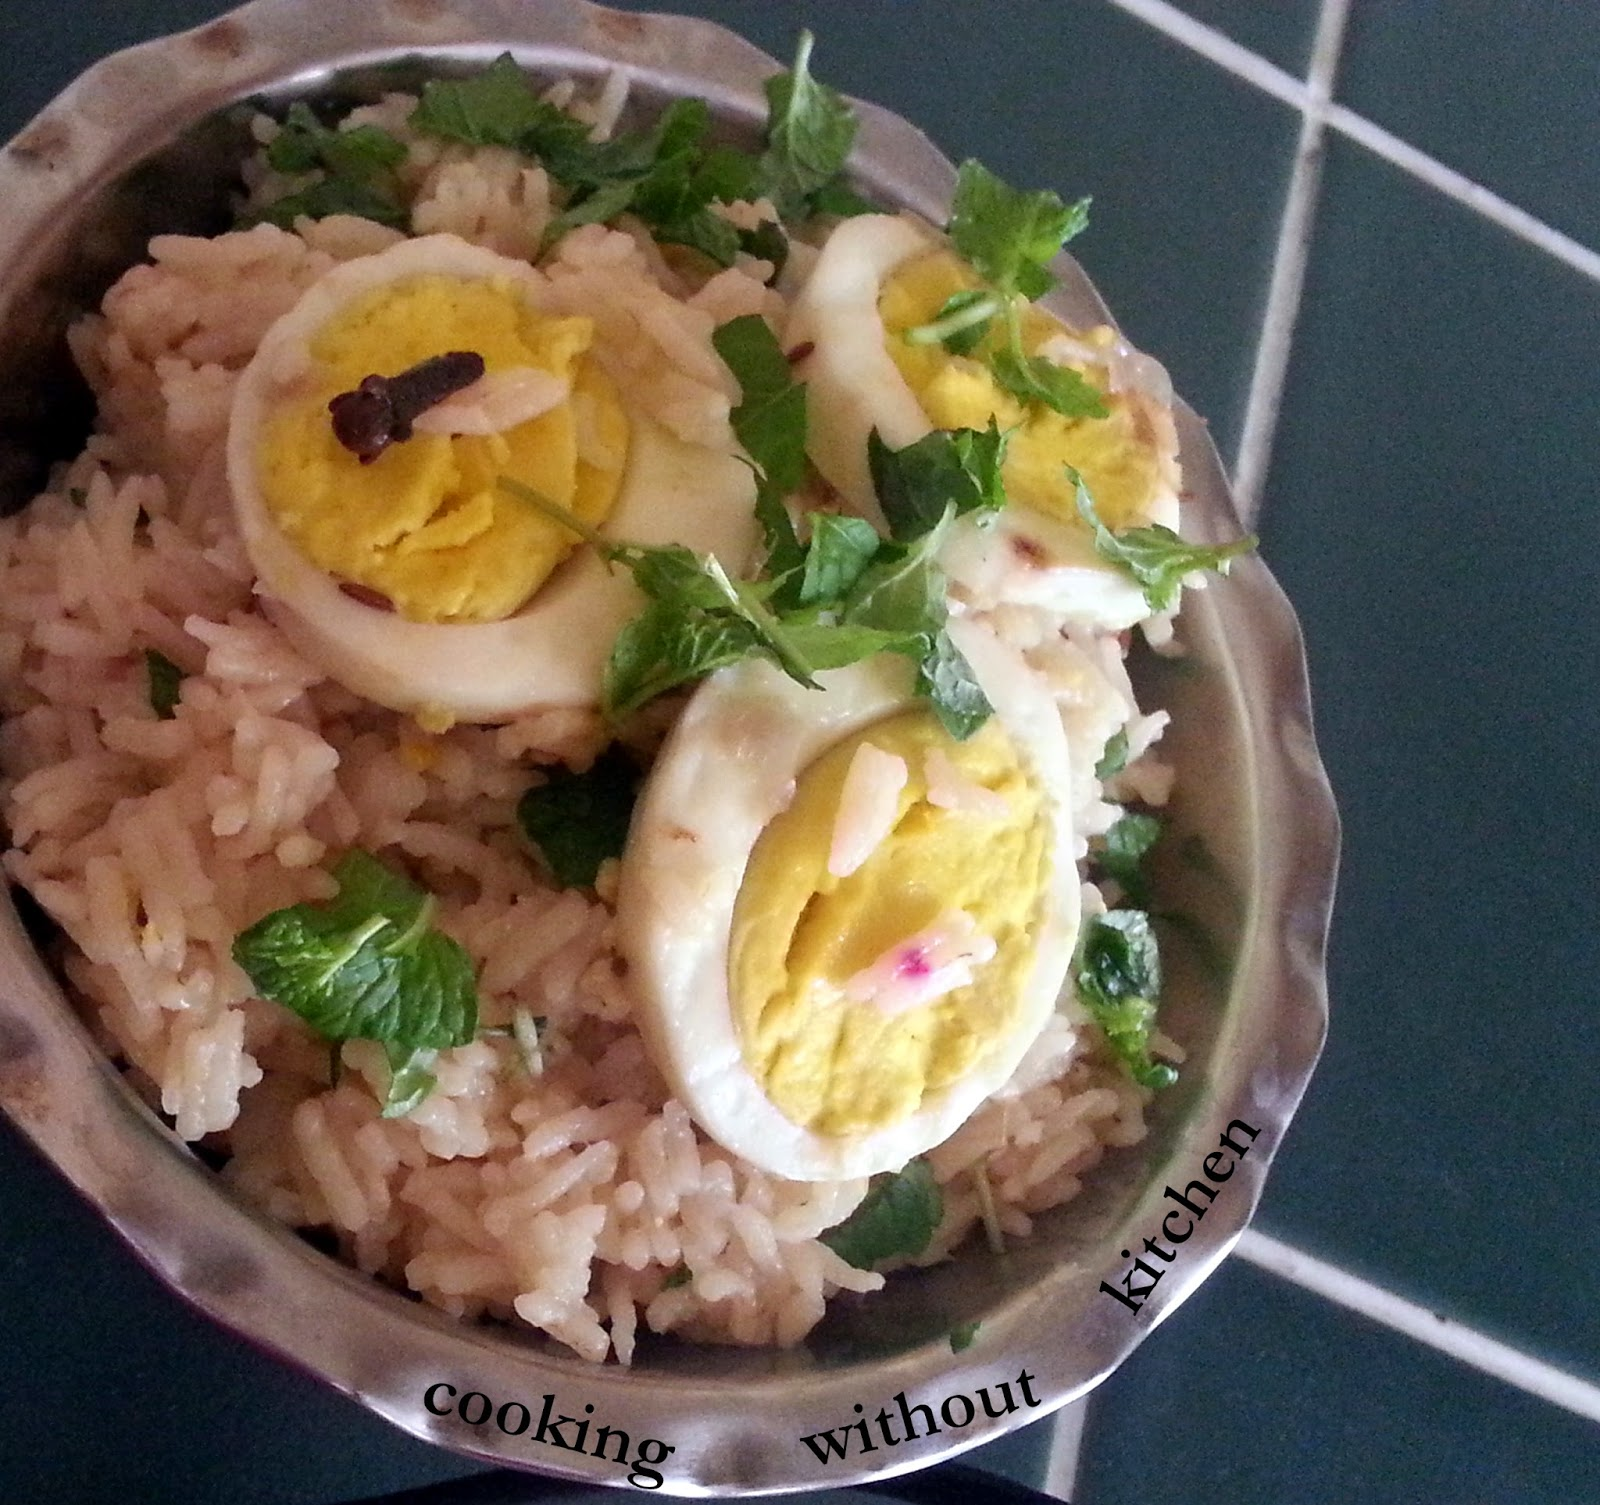 Shahi egg biryani